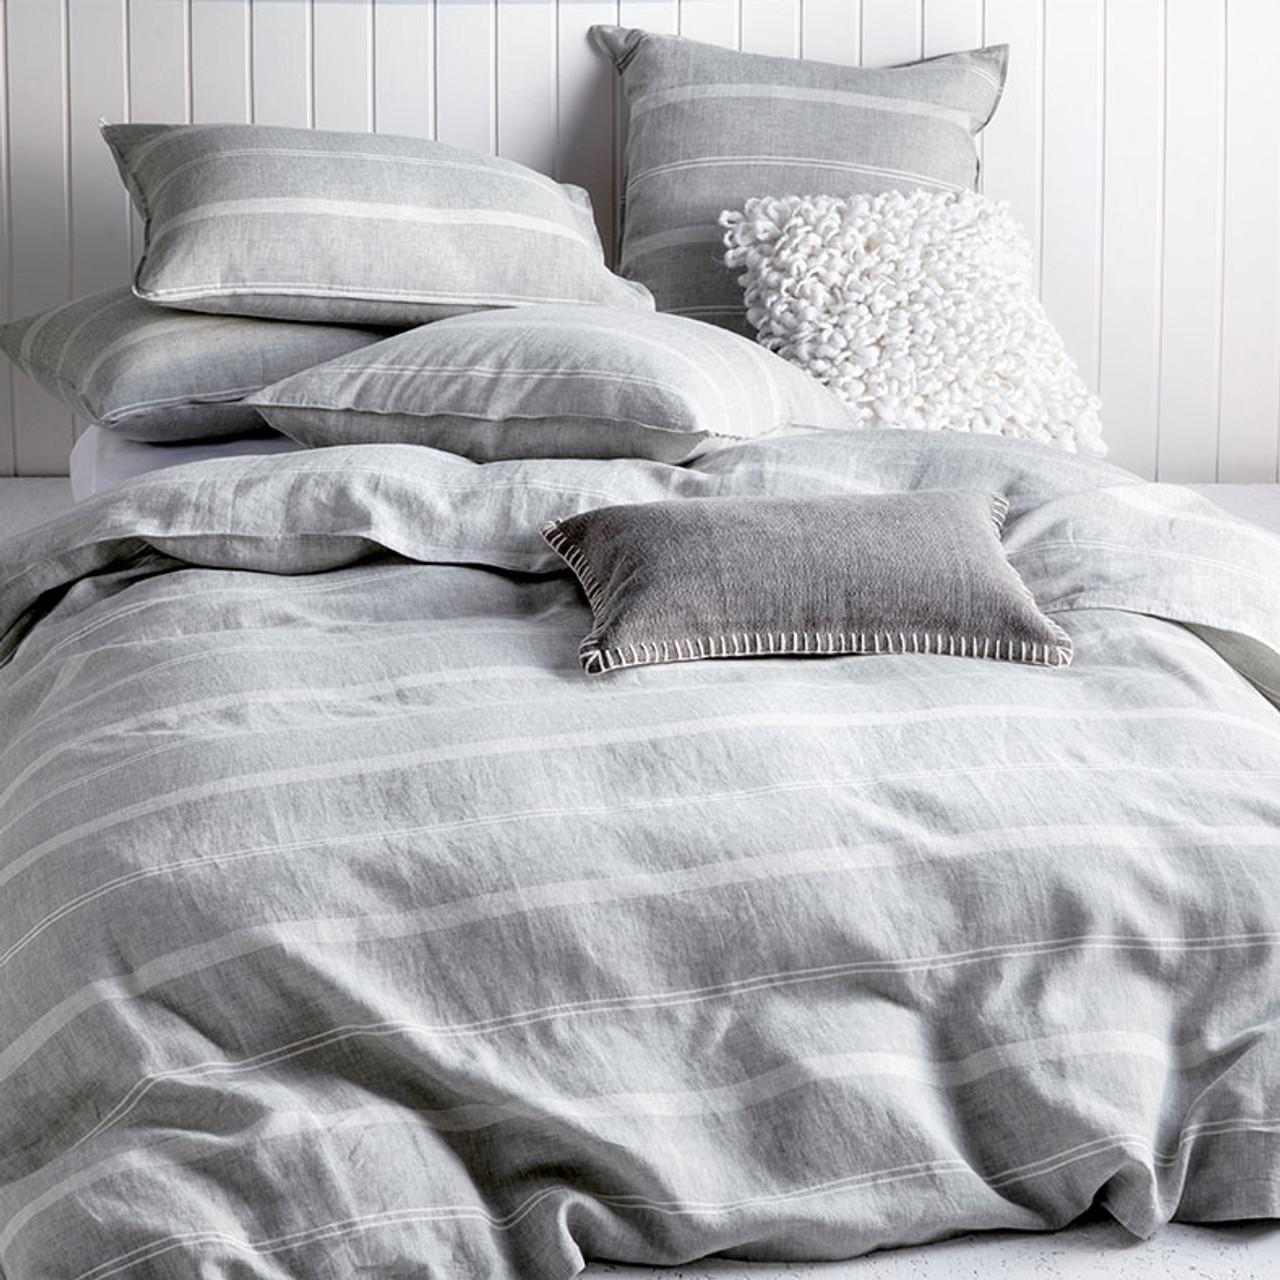 Balmoral Neutral Quilt Cover Set Queen Bed Kas My Linen